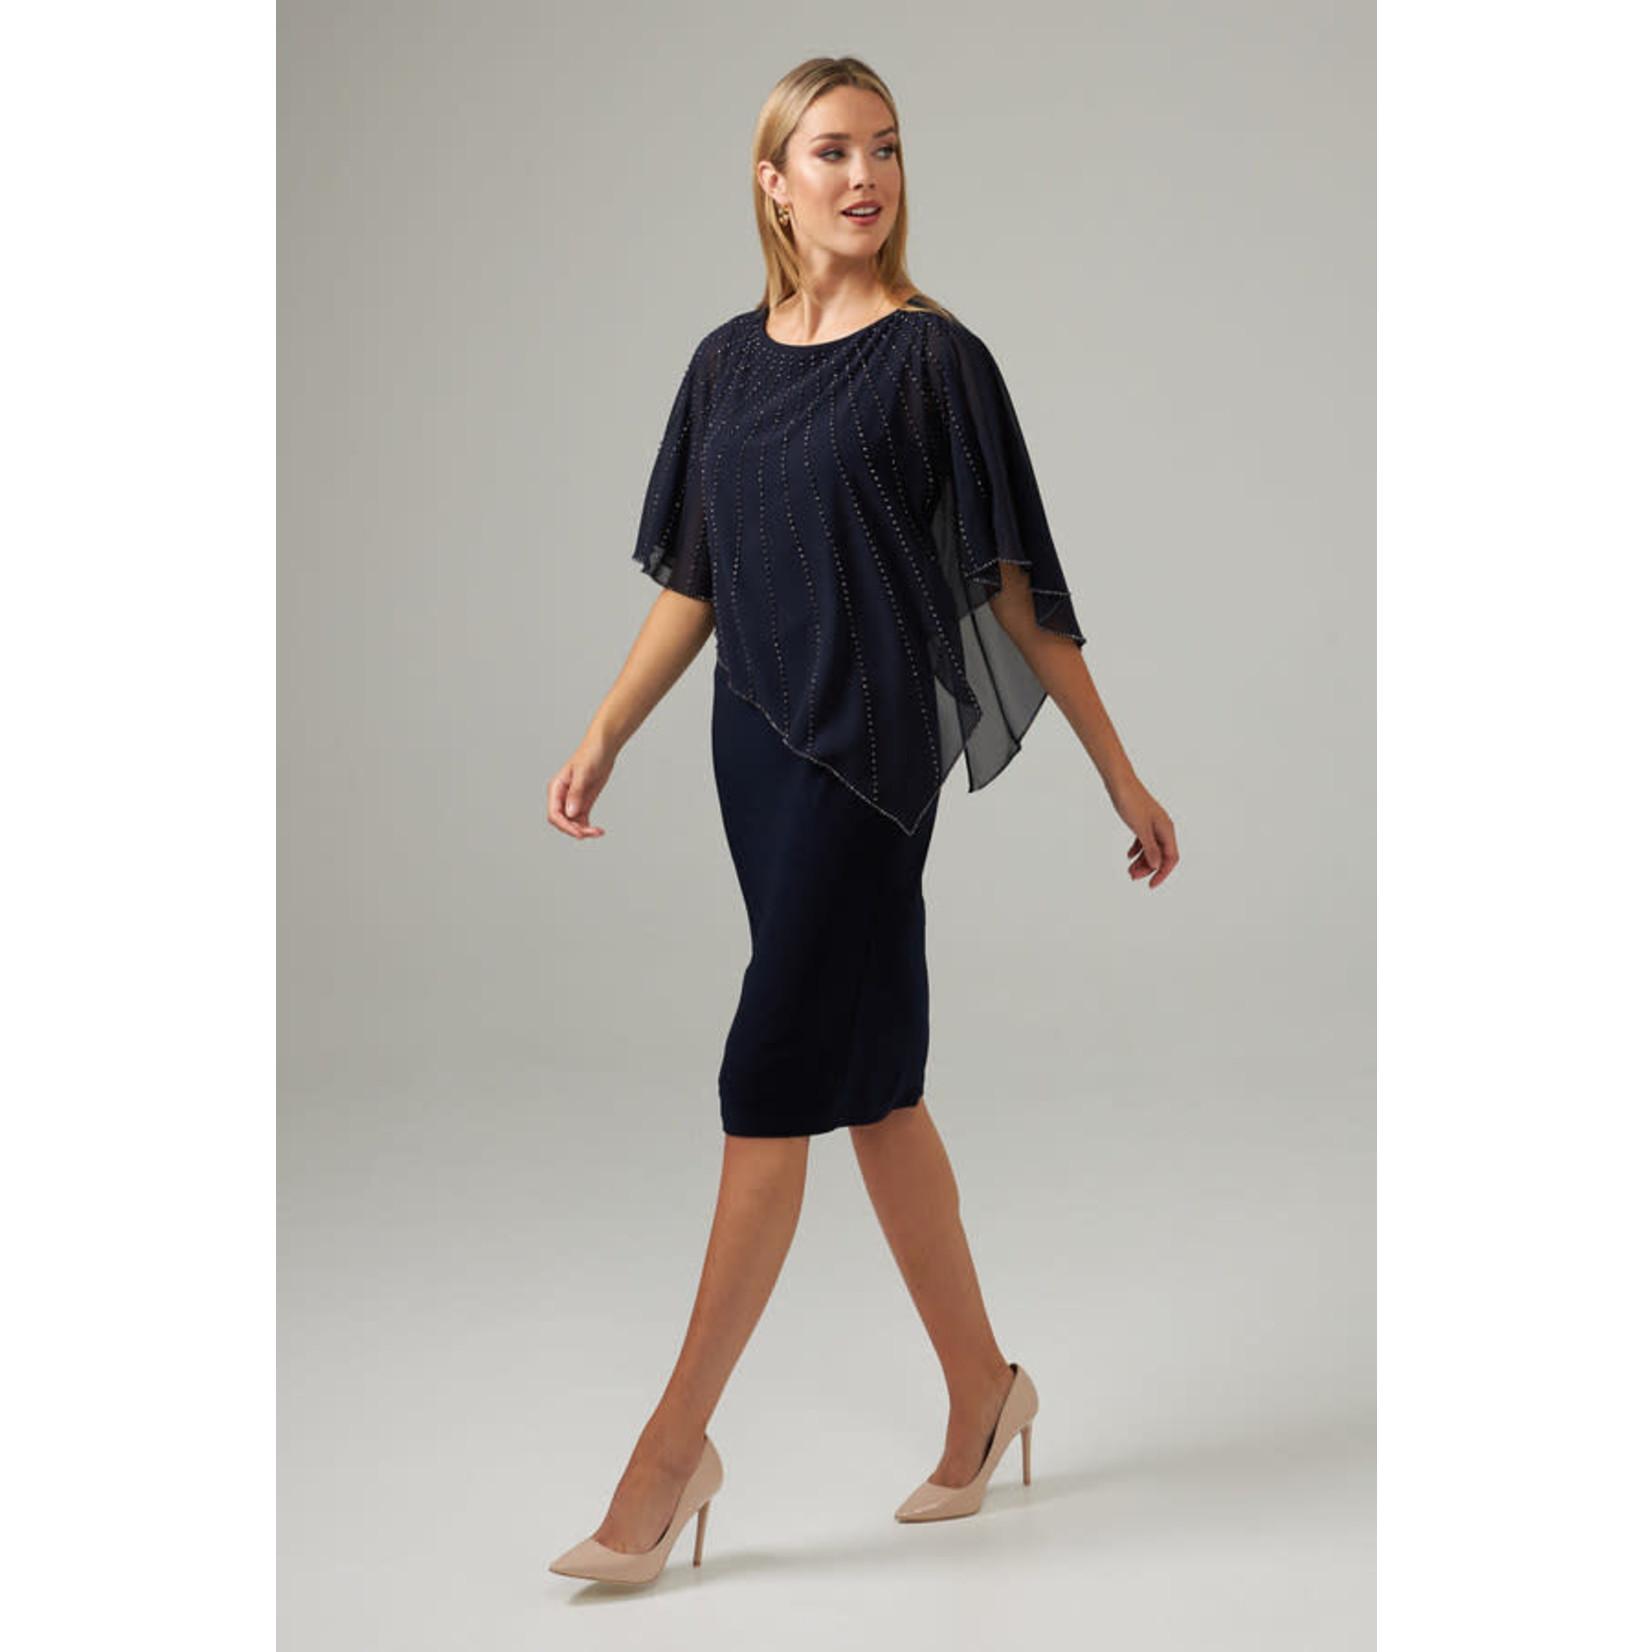 Joseph Ribkoff Ladies Navy Dress